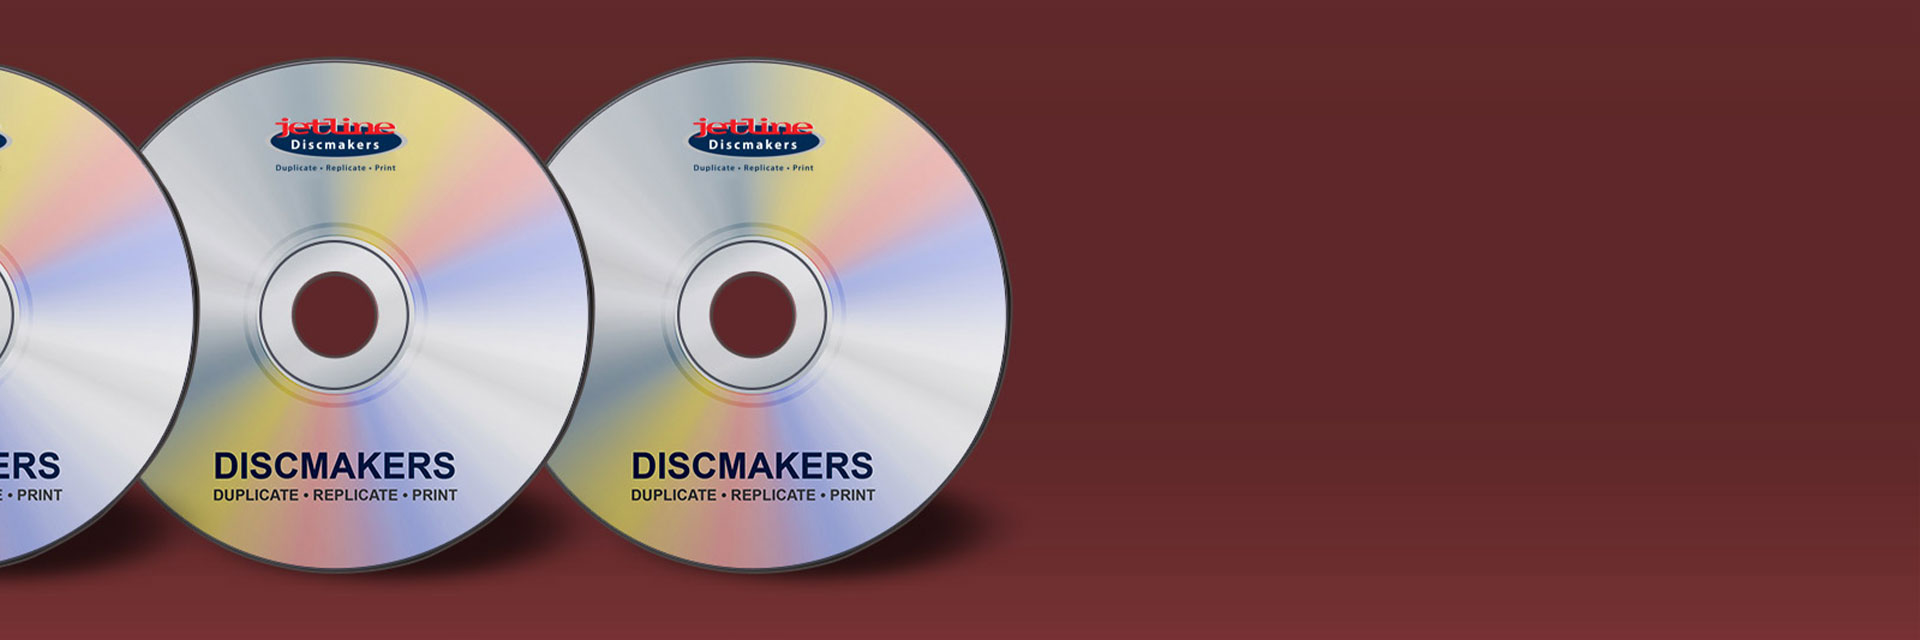 jetline-discmakers-slider